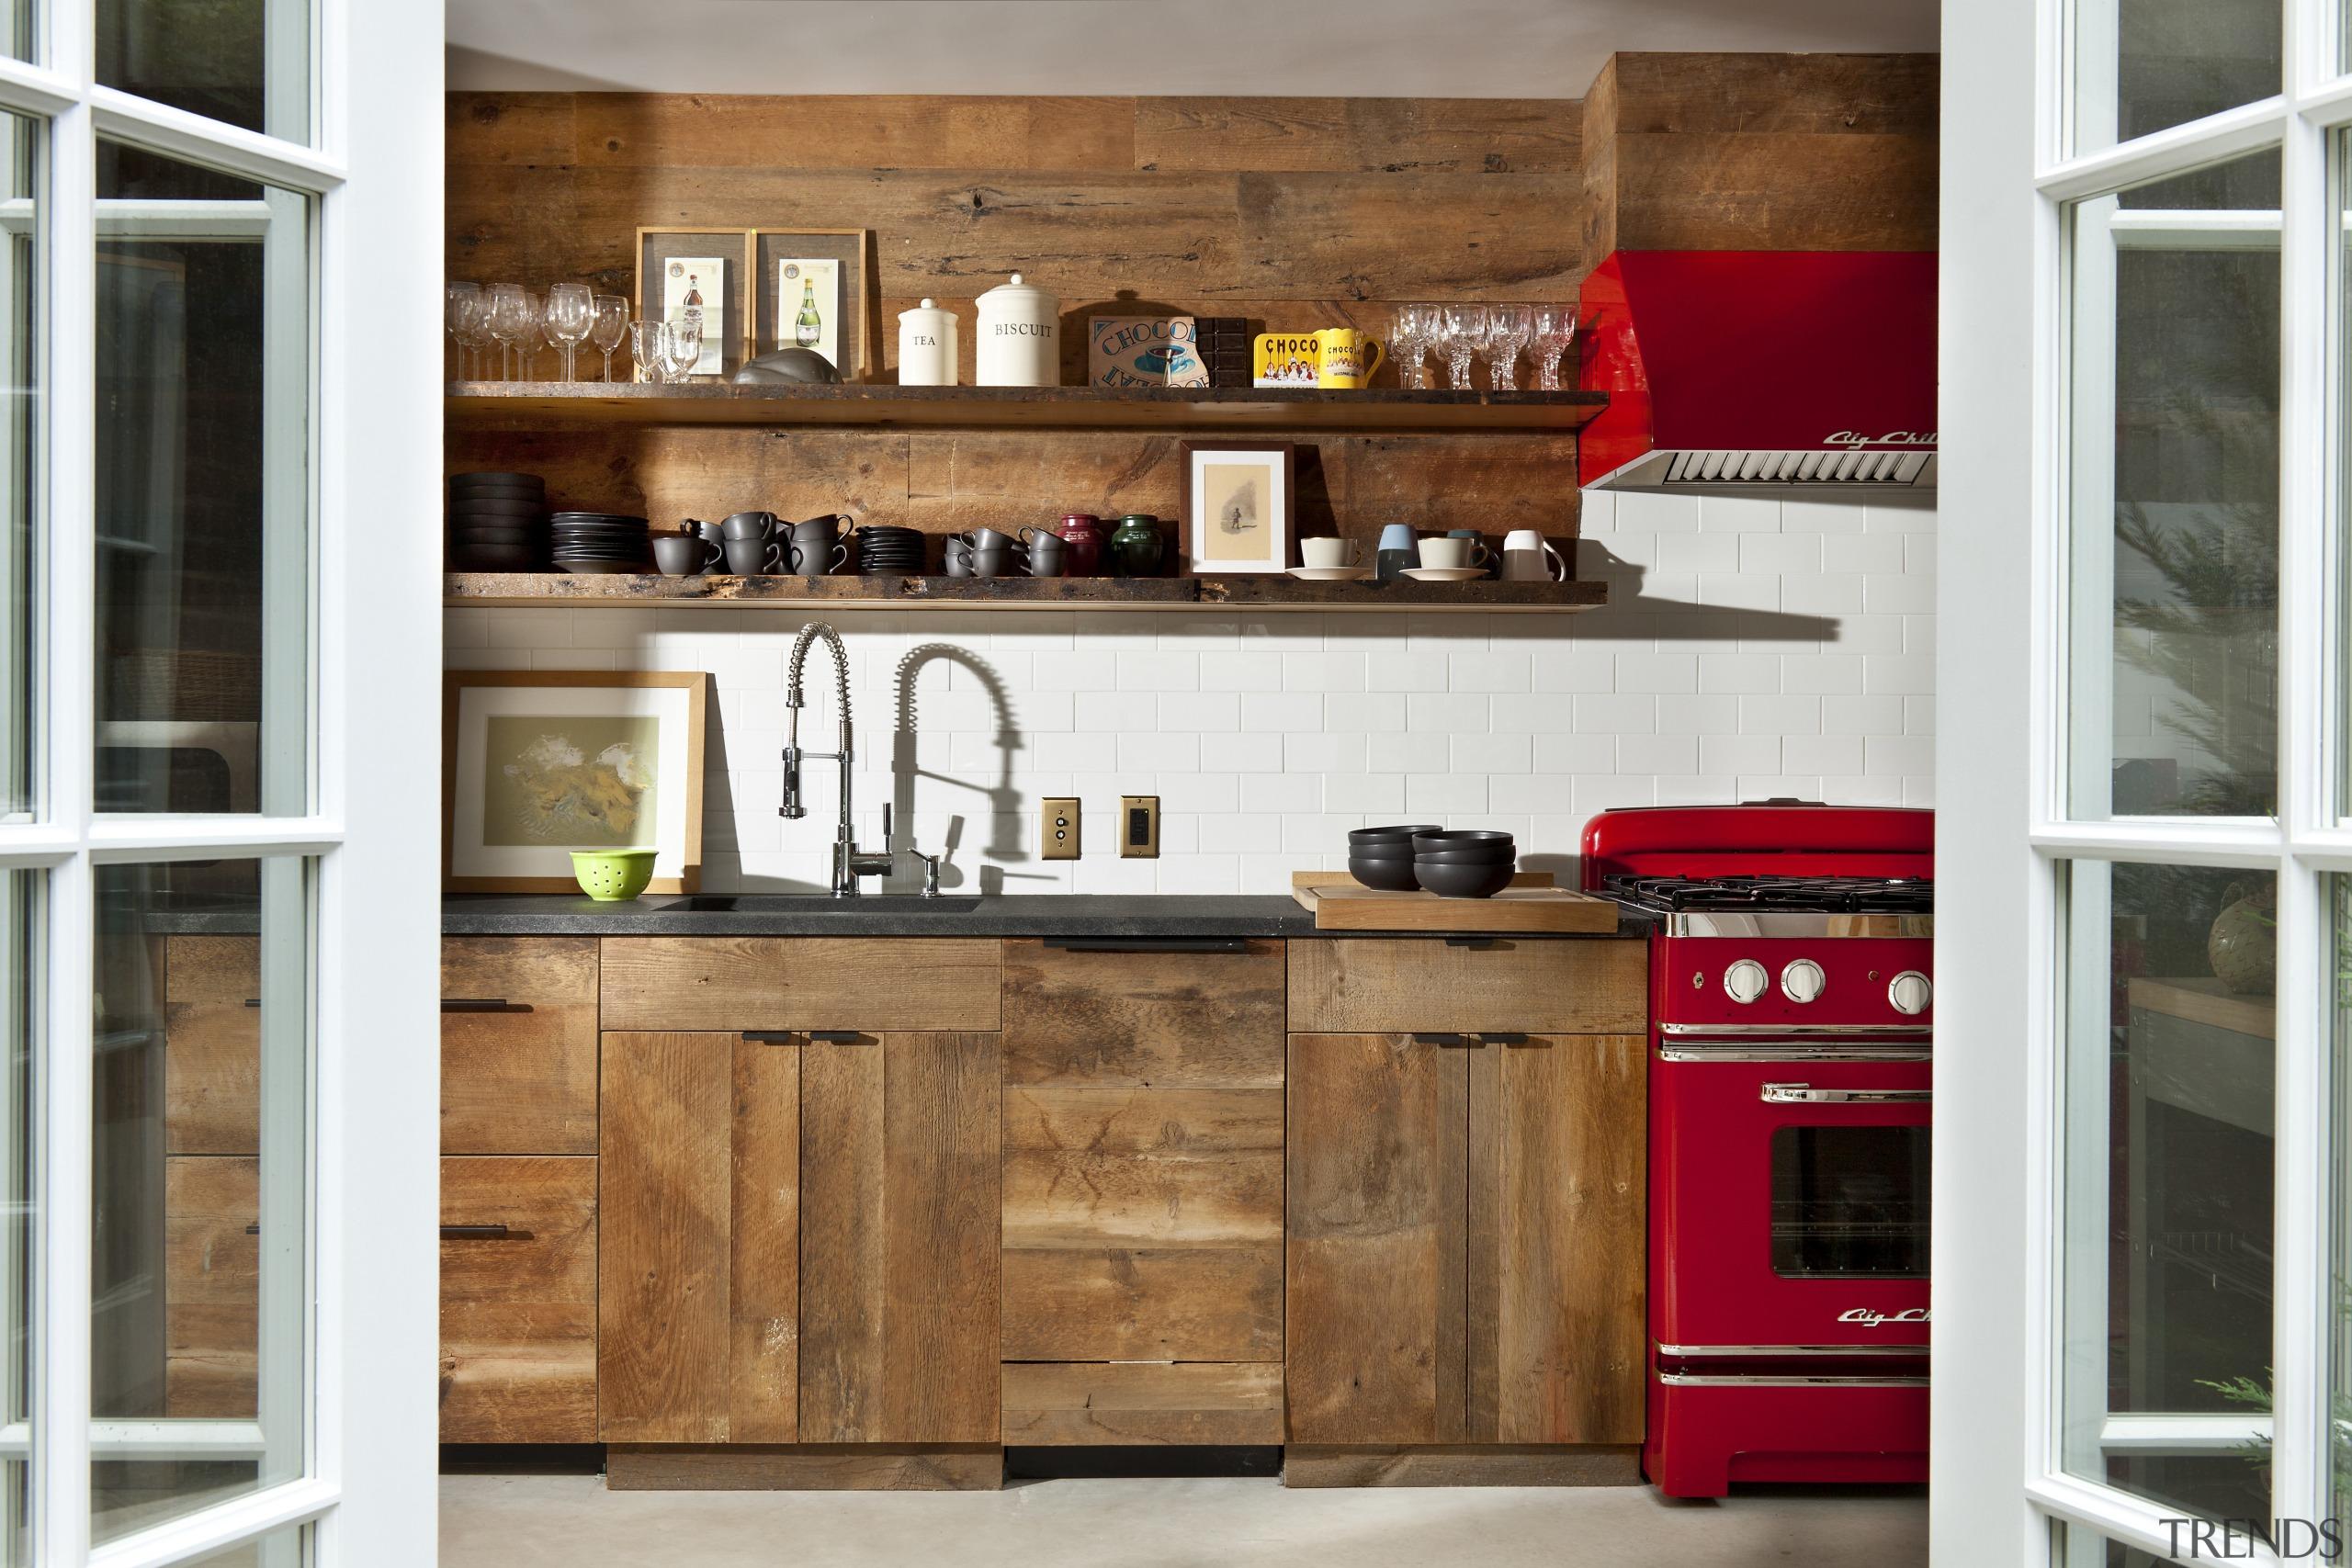 Kitchenette in Manhattan townhouse remodel - Kitchenette in cabinetry, countertop, cuisine classique, furniture, interior design, kitchen, shelf, wood, white, brown